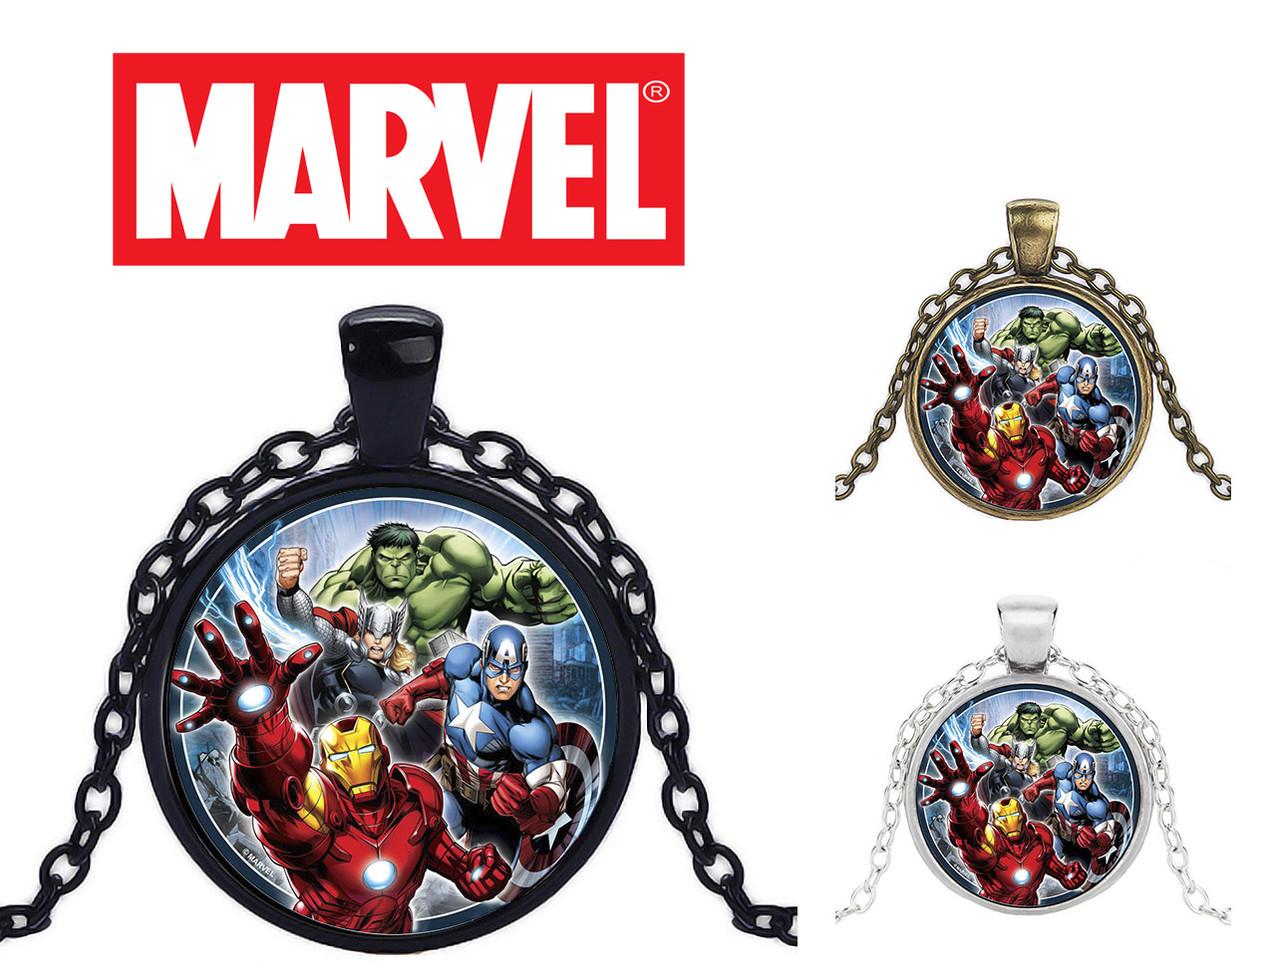 Кулон с изображением всех персонажей Avengers Мстители